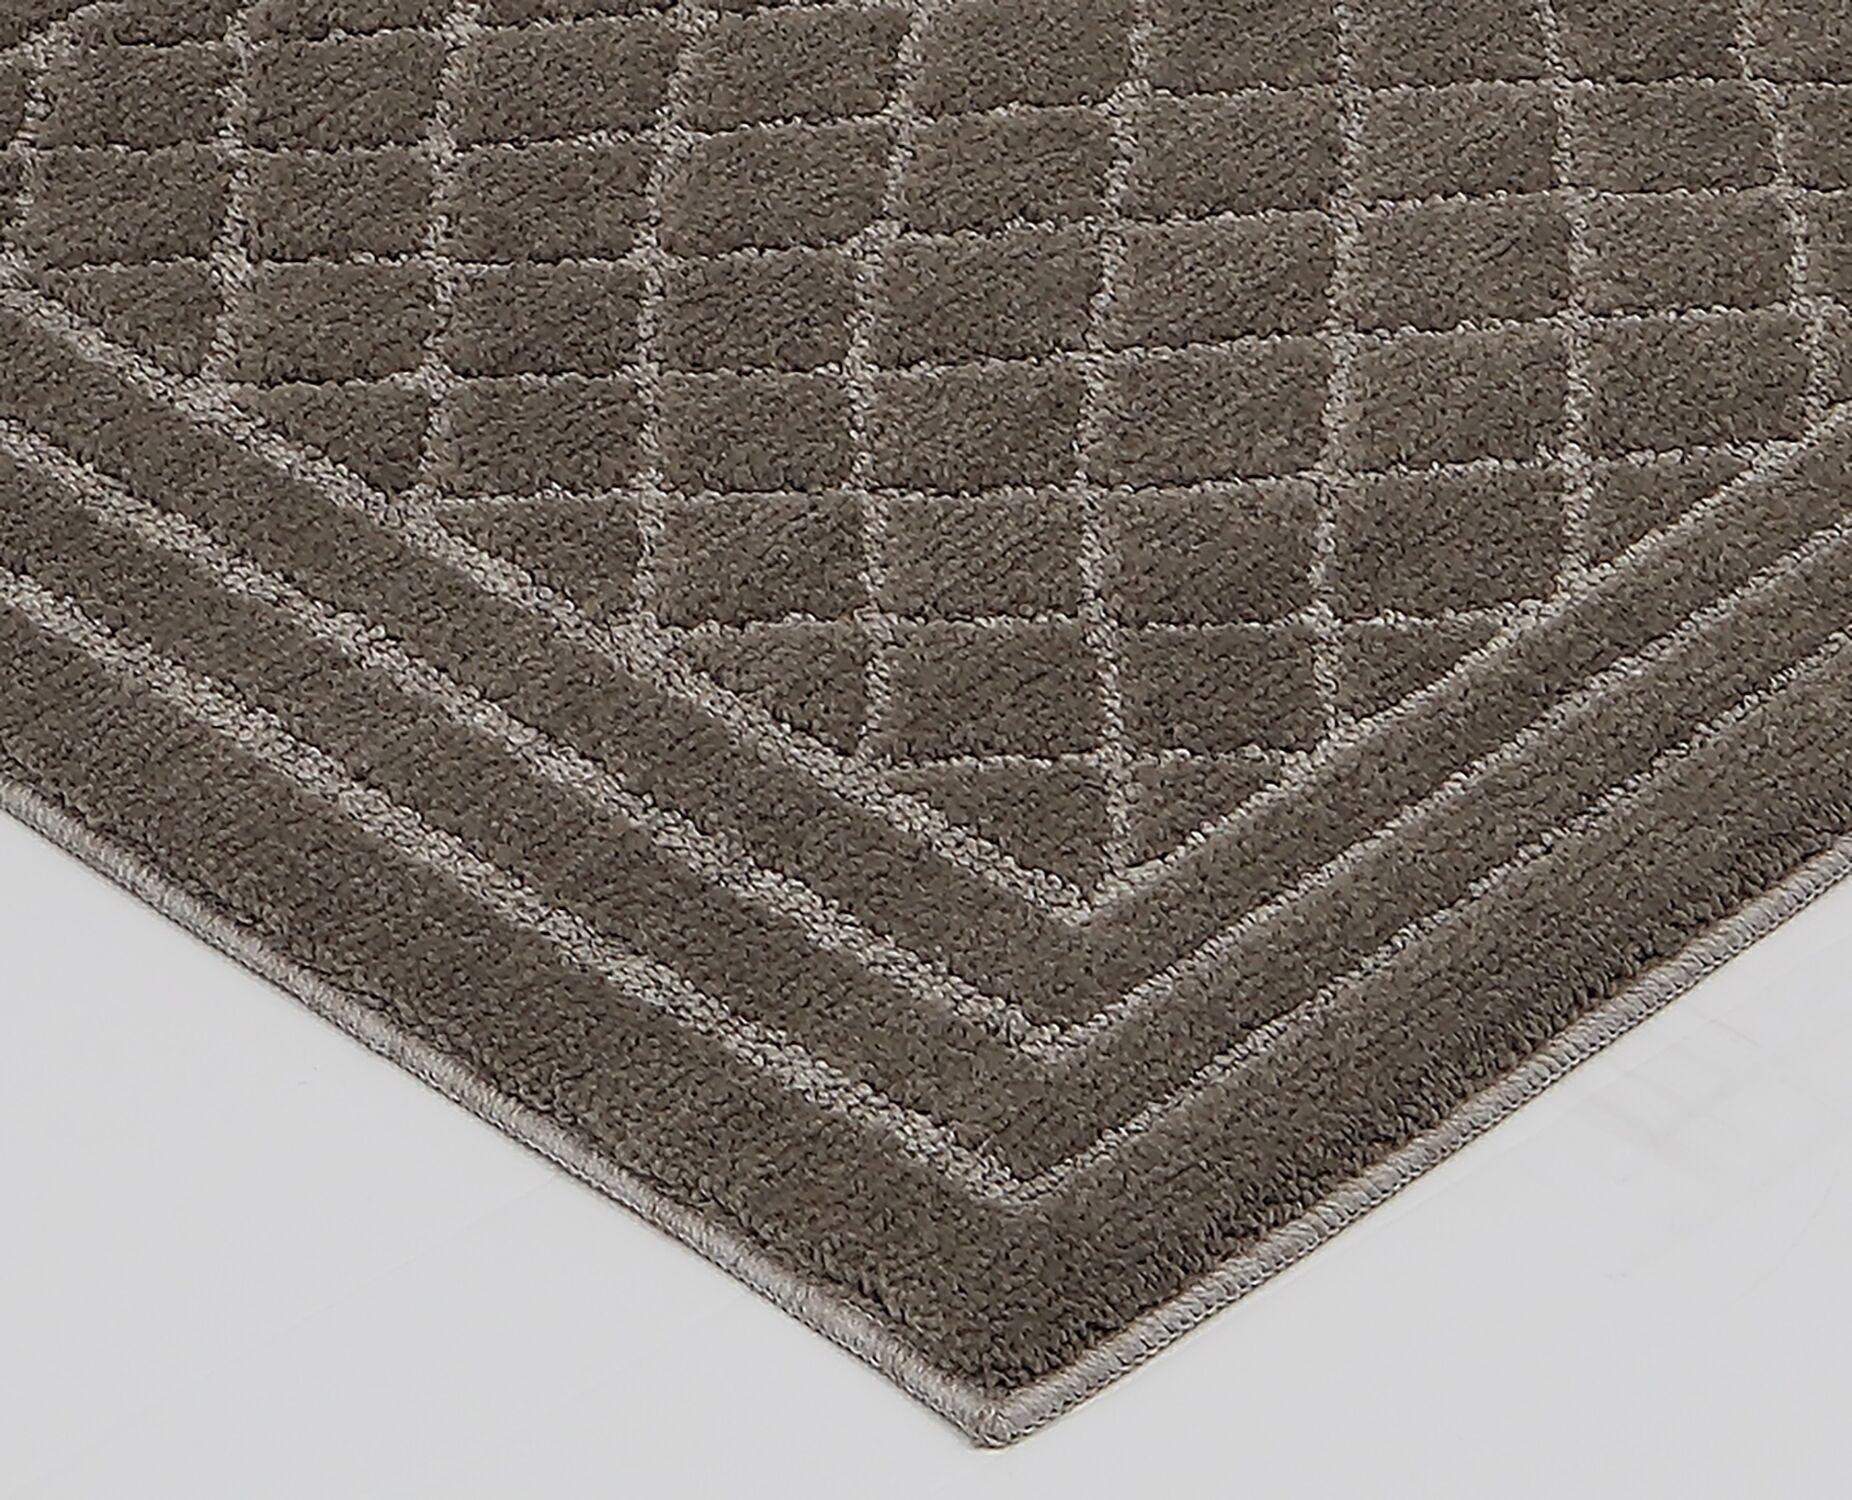 Nordham Brown Area Rug Rug Size: Rectangle 1'8